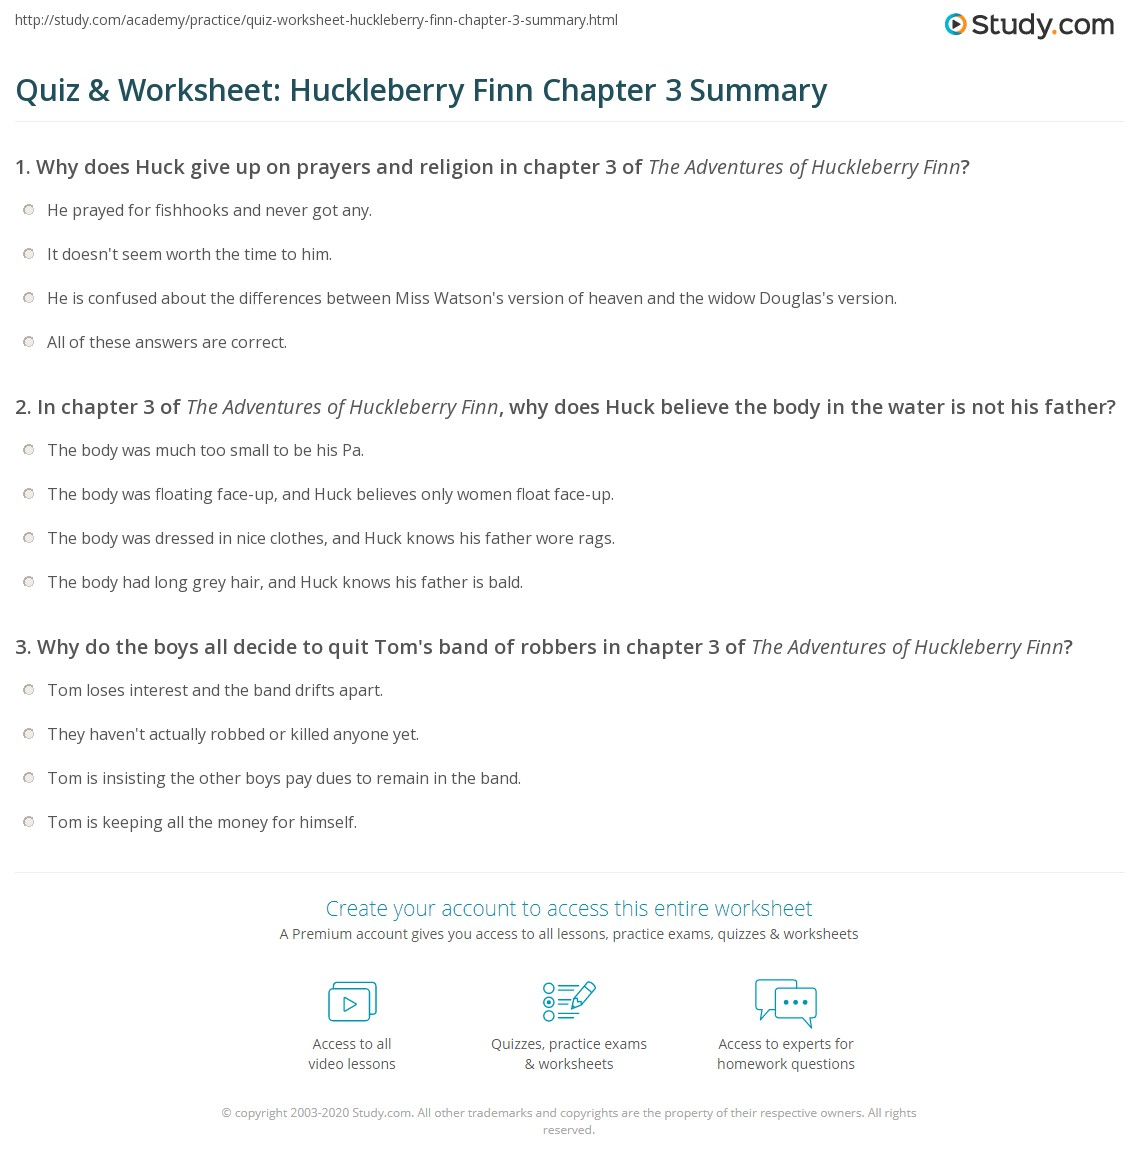 Print The Adventures of Huckleberry Finn Chapter 3 Summary Worksheet